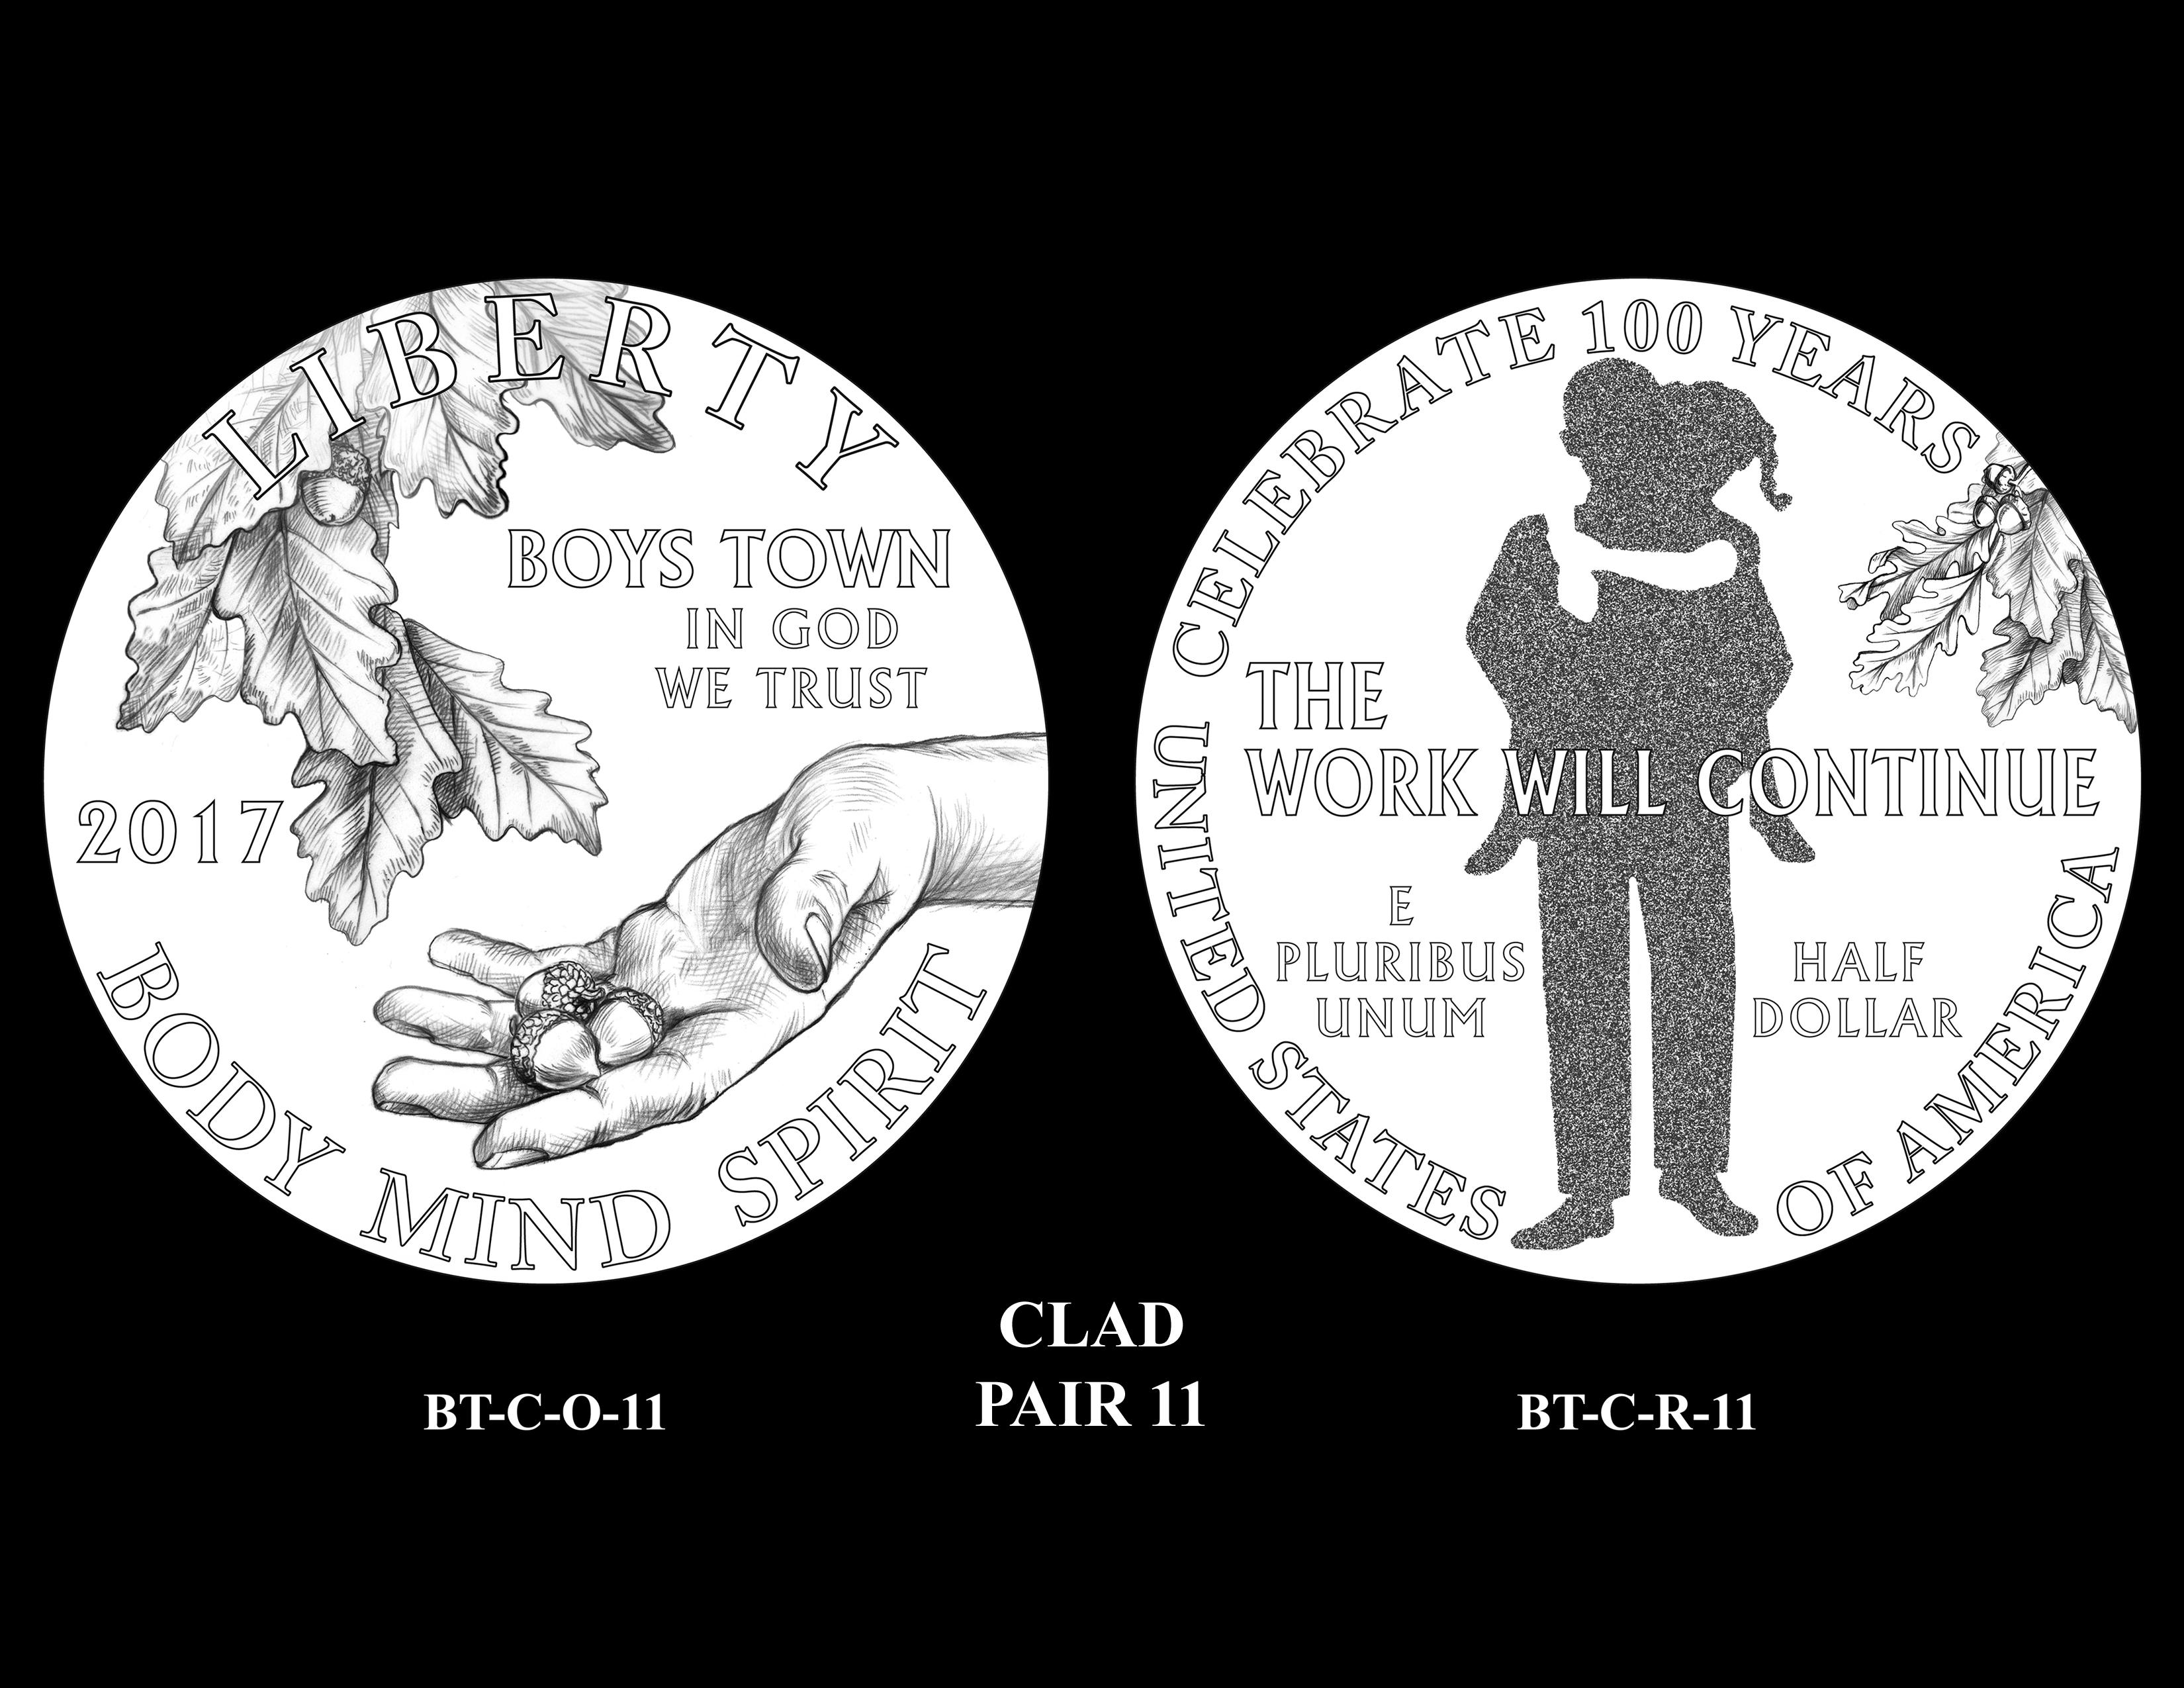 Clad-Pair-11 -- 2017 Boystown Centennial Commemorative Coin  Program